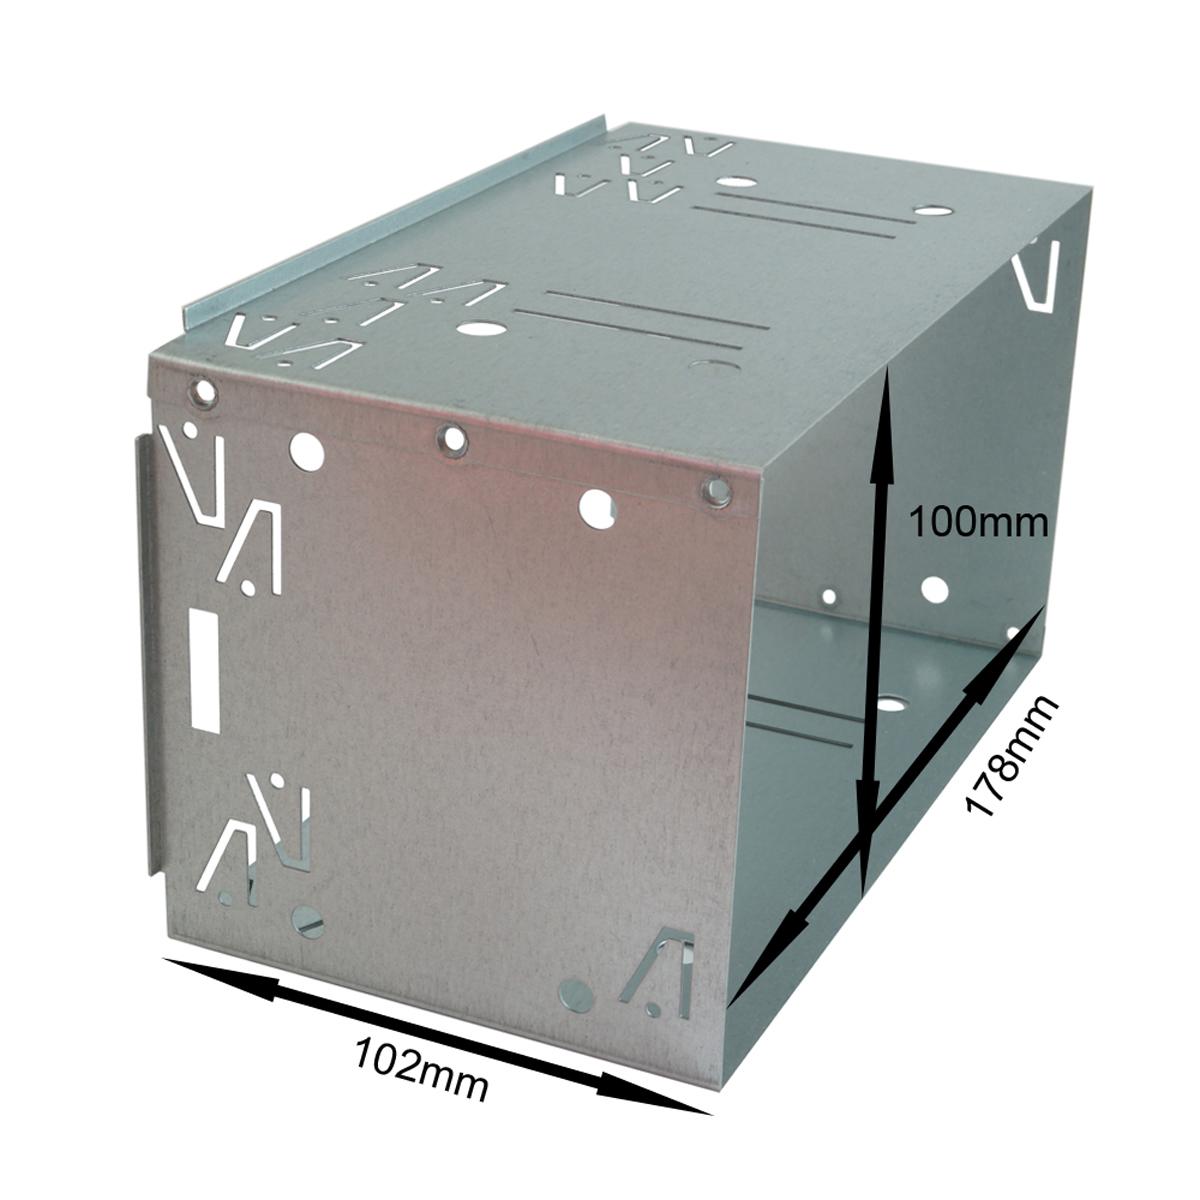 2din doppel din metal rahmen einbauschacht radioblende. Black Bedroom Furniture Sets. Home Design Ideas